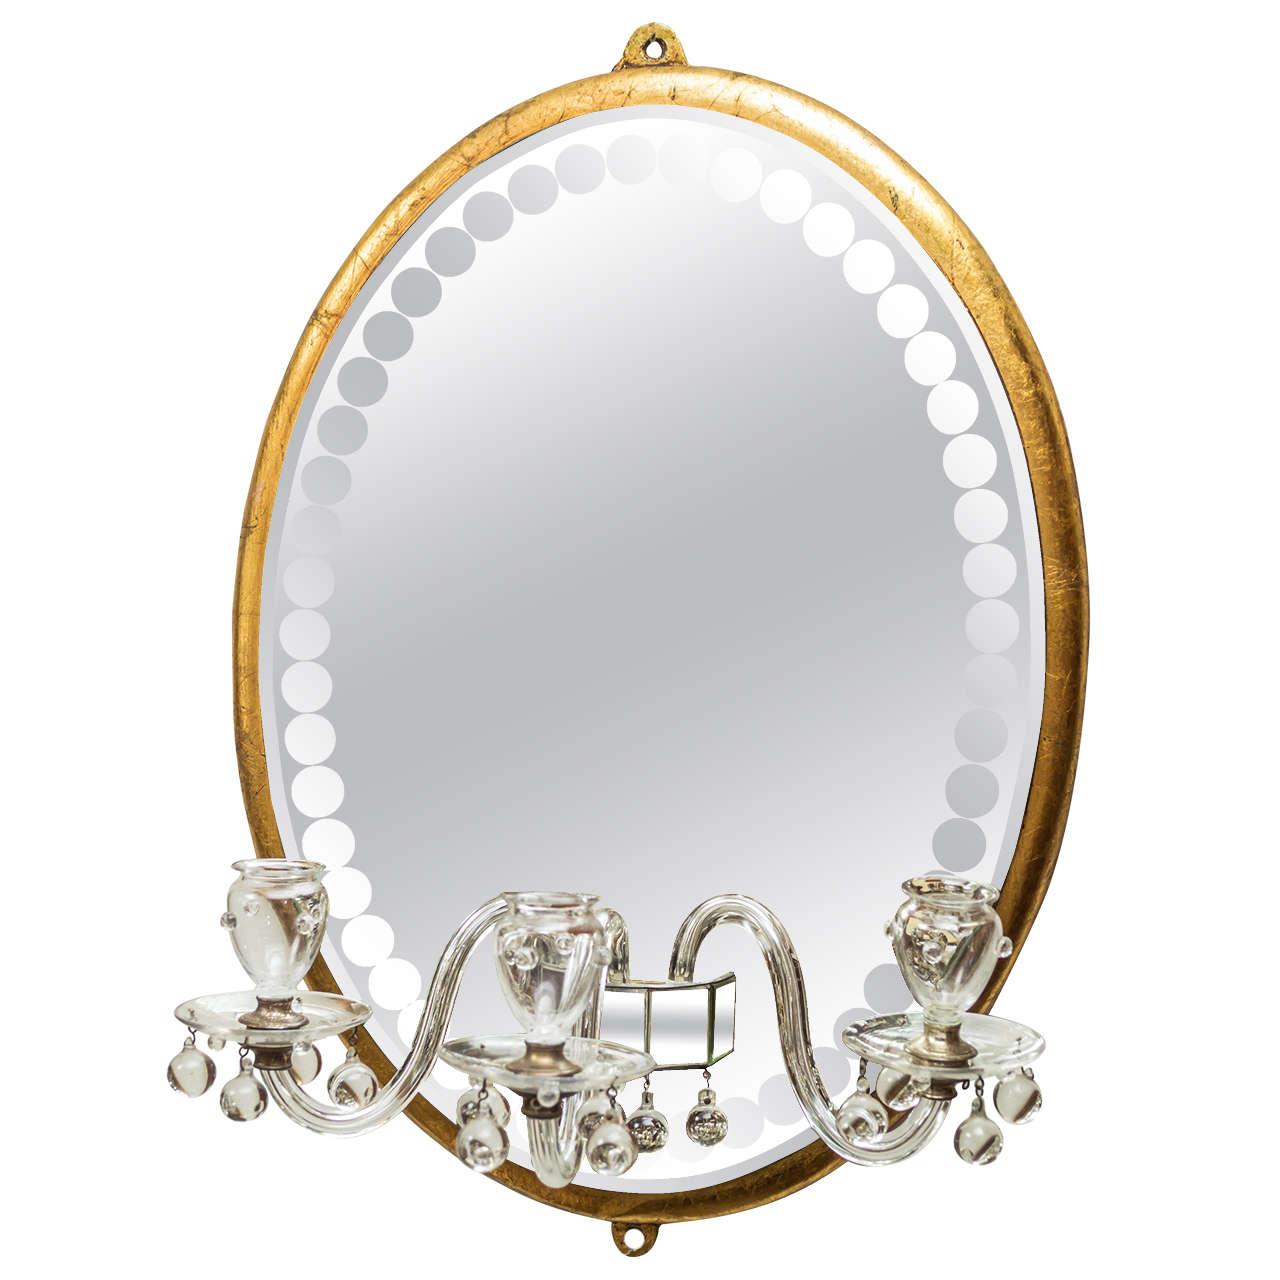 Mid-20th Century Oval Girandole Mirror in the Style of Maison Bagués